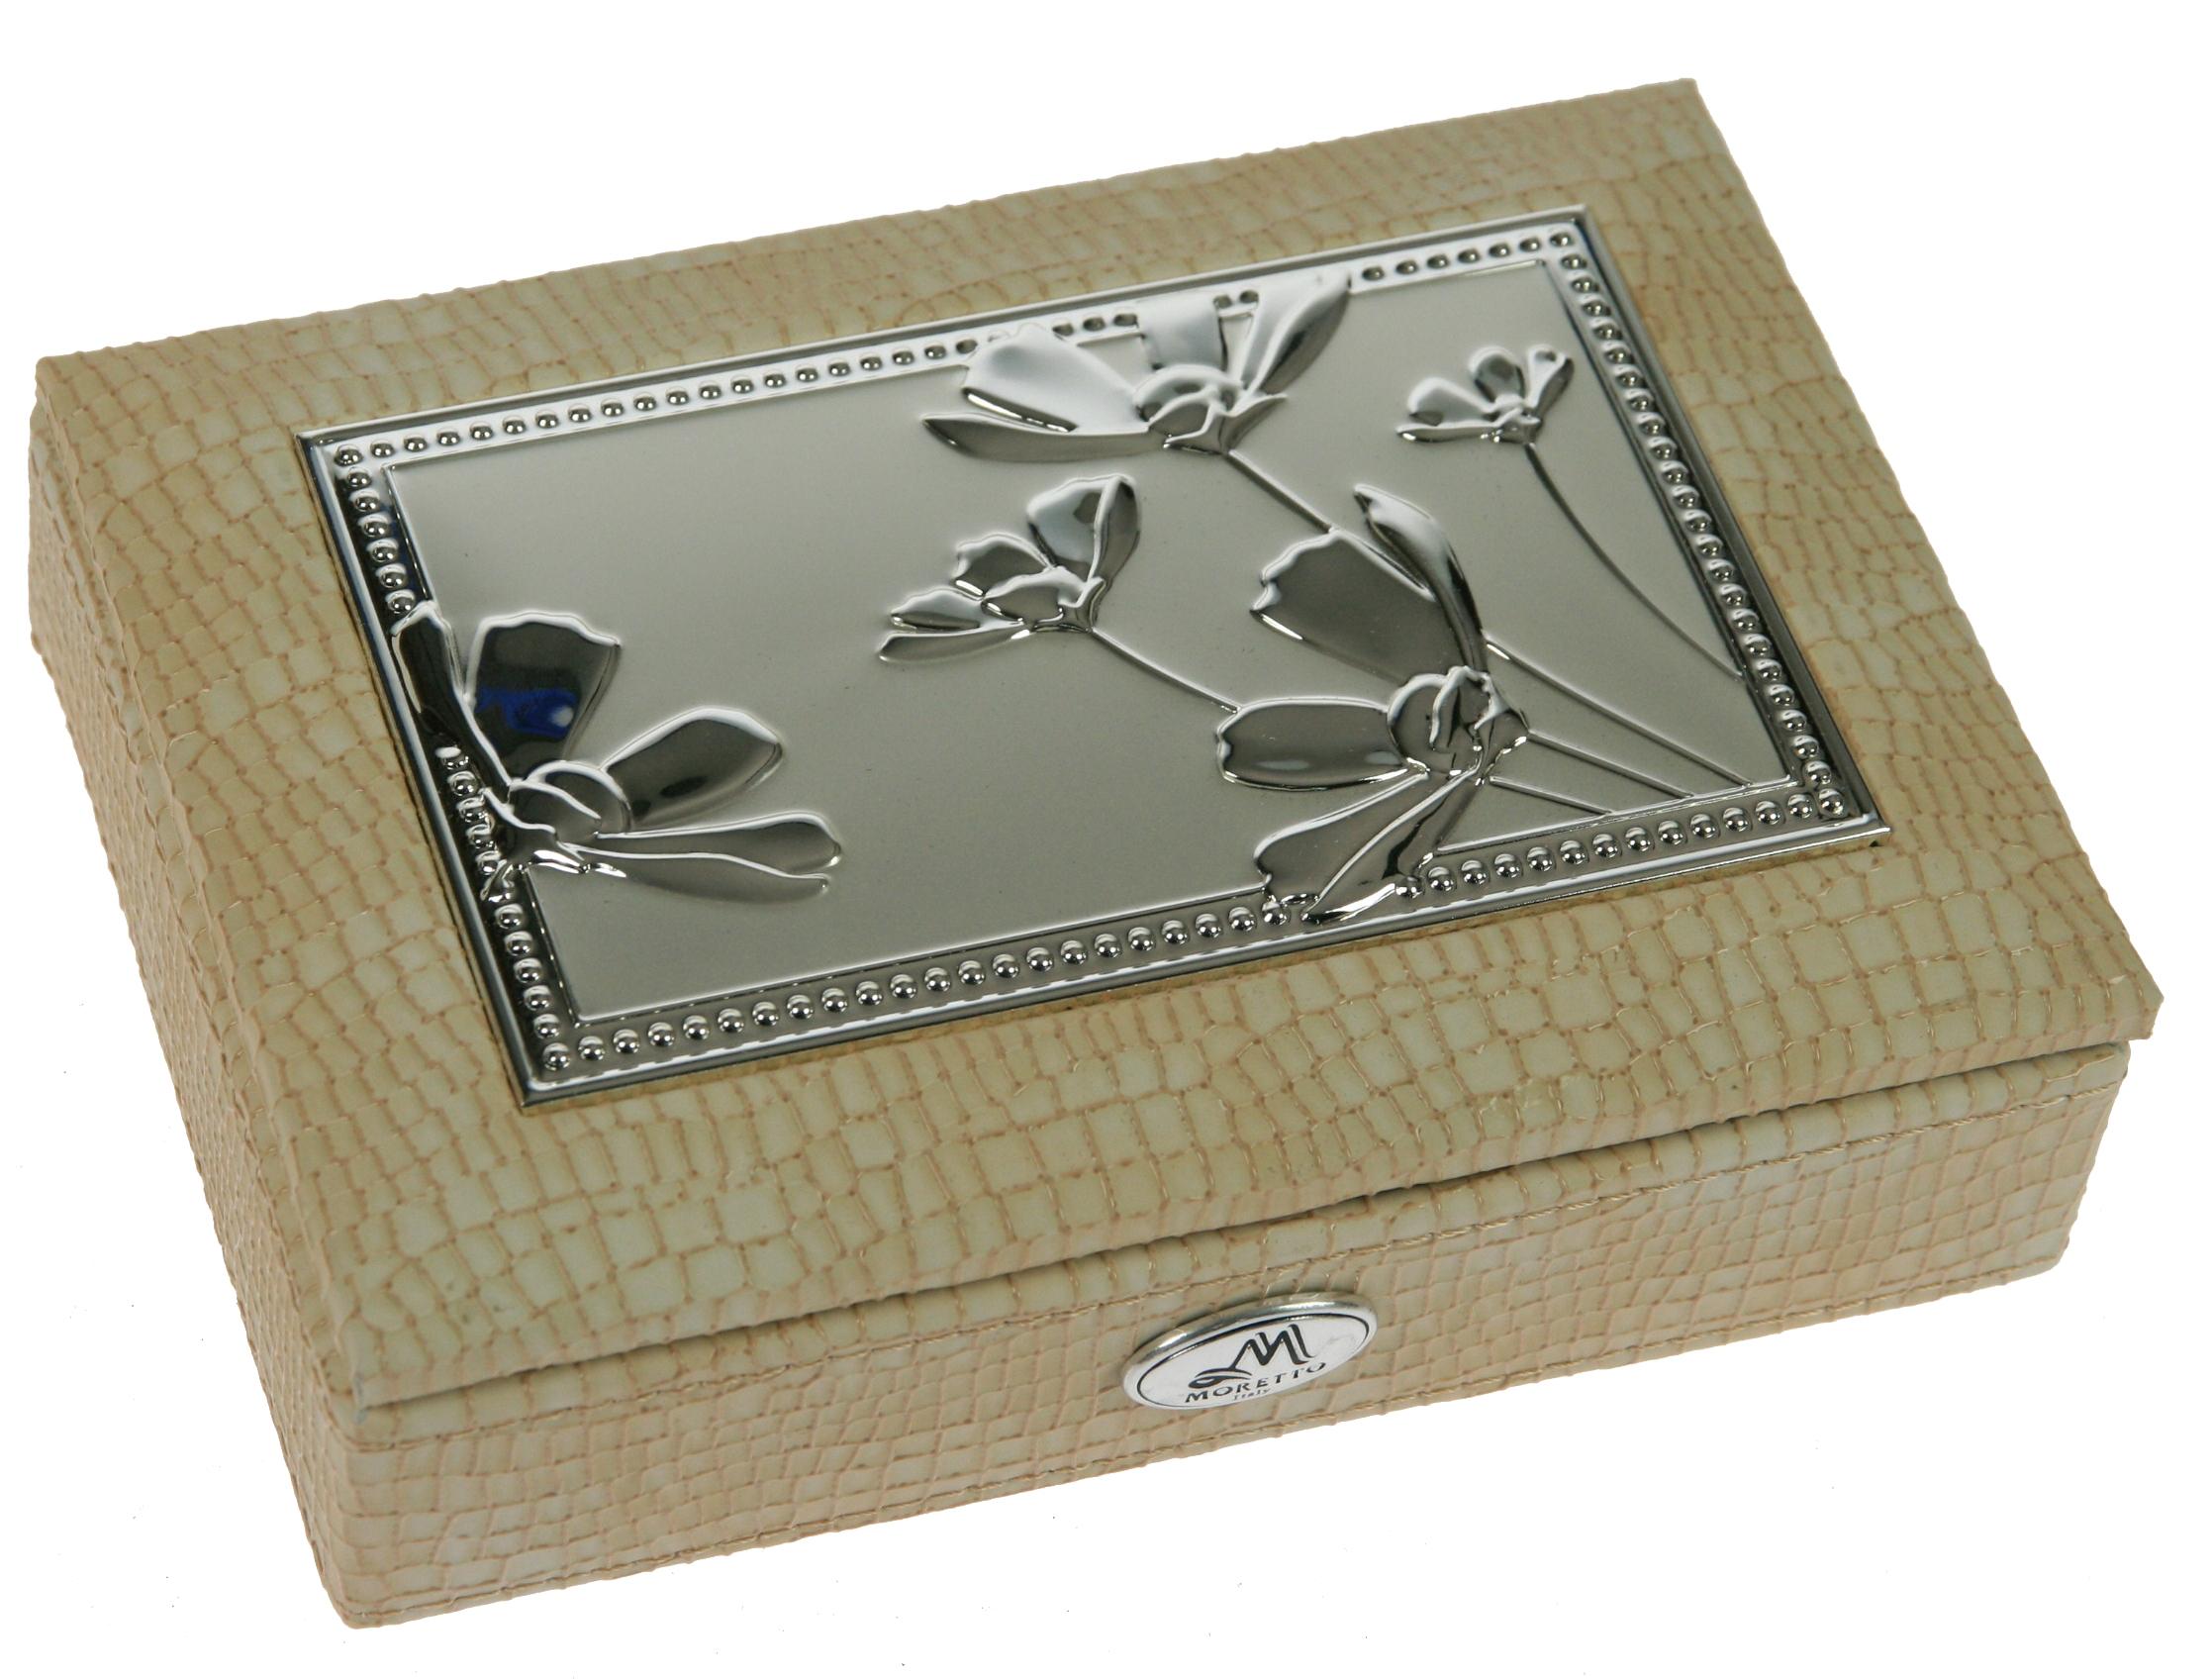 Шкатулка для ювелирных украшений Moretto, 18 х 13 х 5 см. 39943 шкатулка фоторамка ювелирная moretto 24 х 19 х 5 см 139555